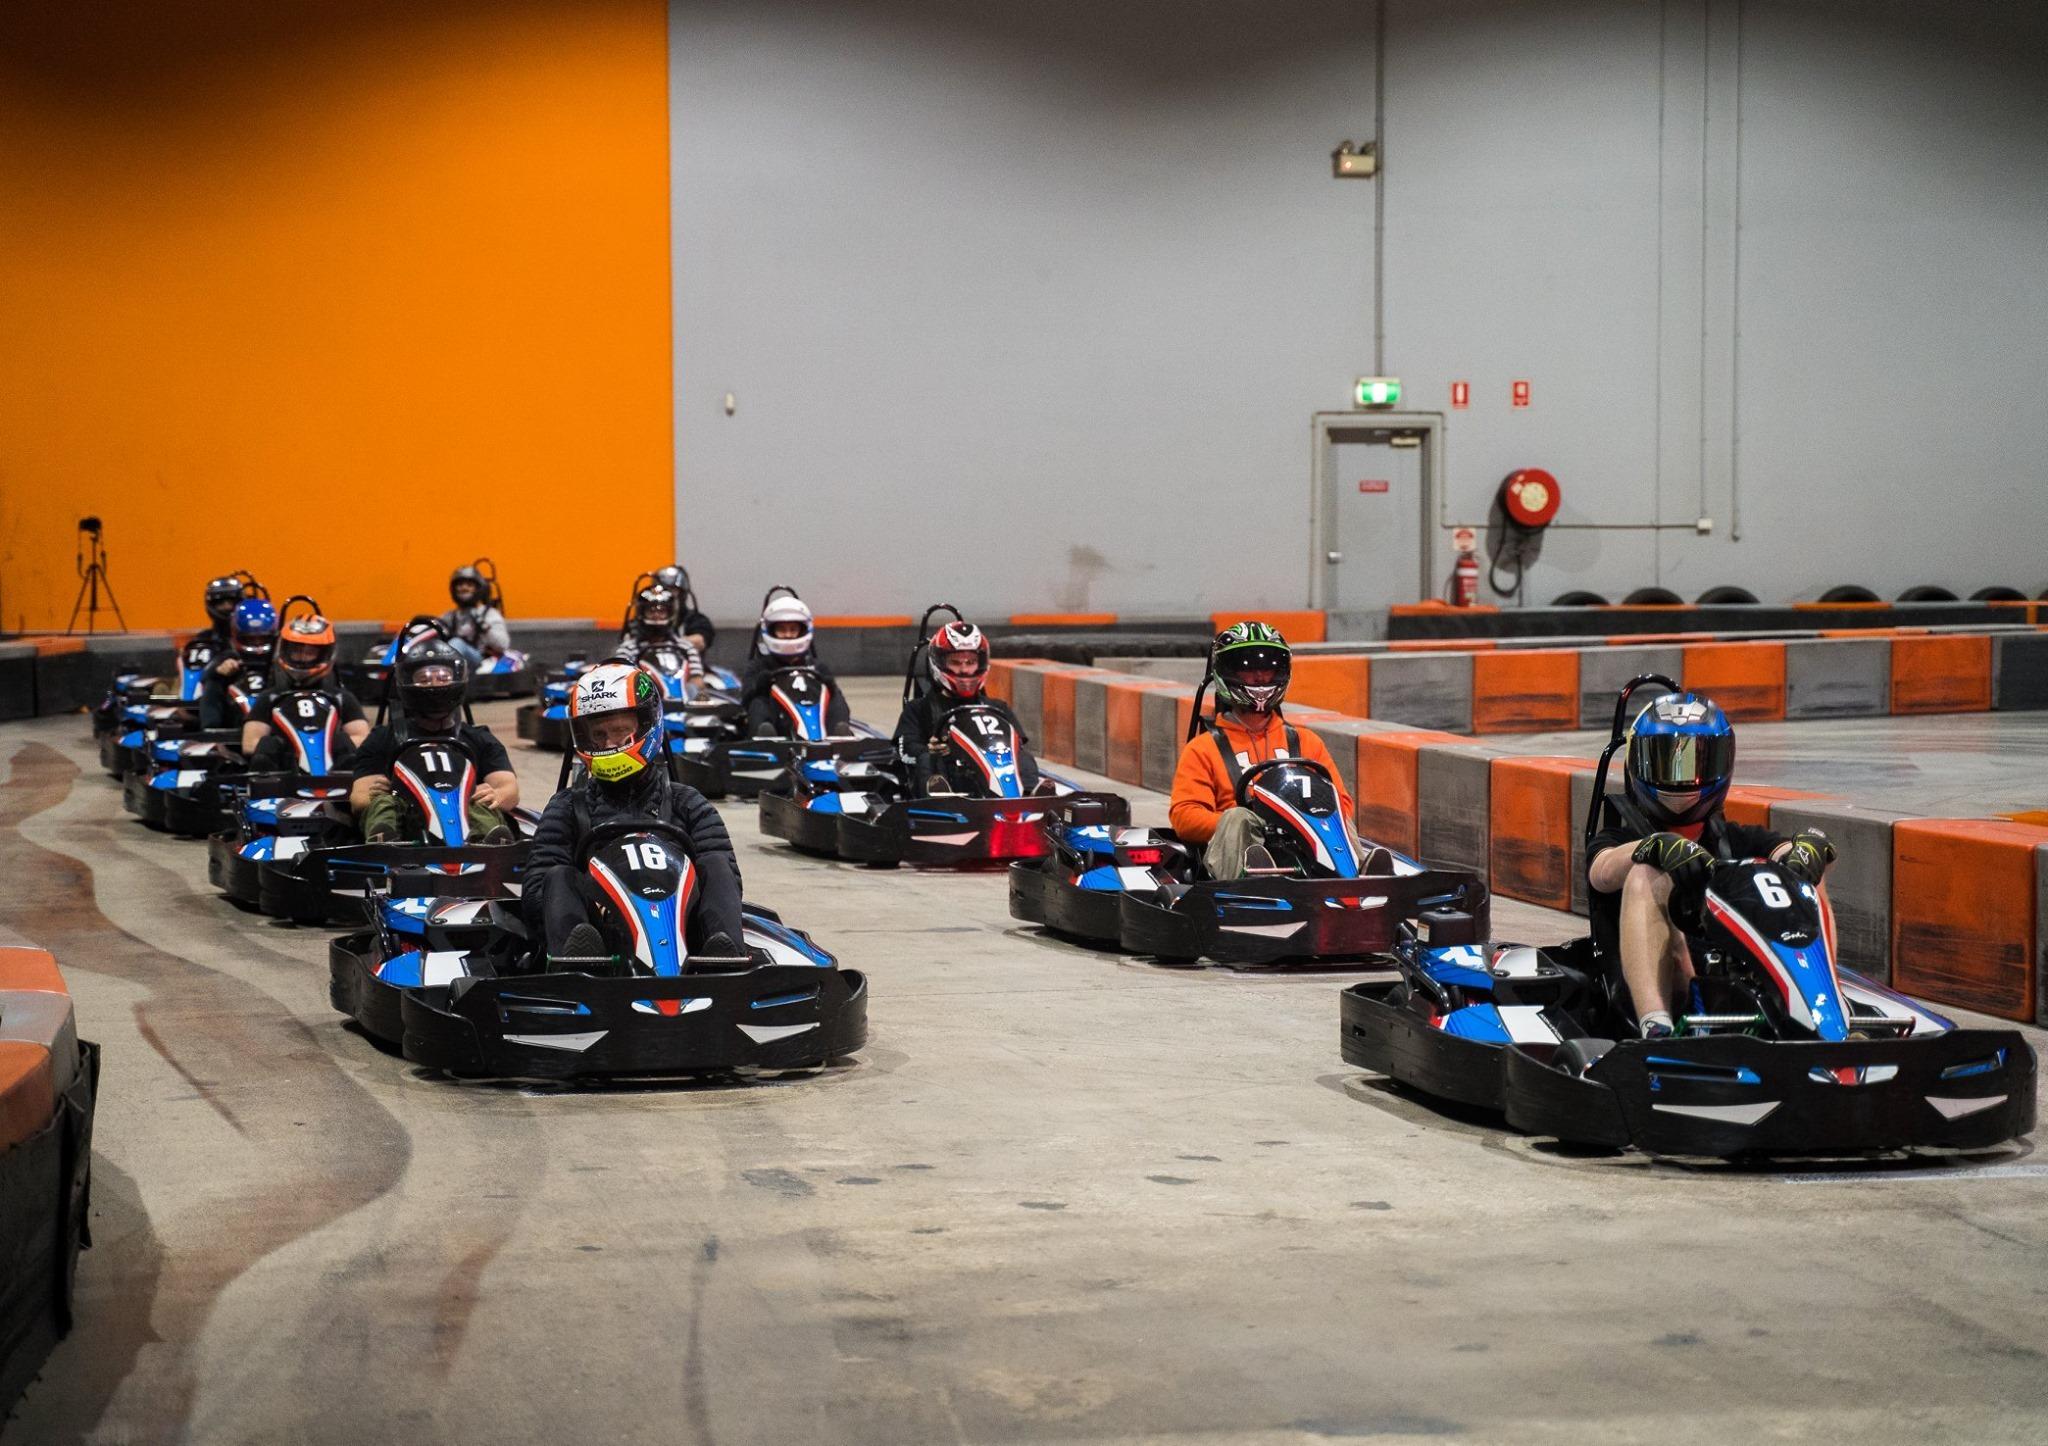 People in go-karts at Ultimate Karting Sydney.